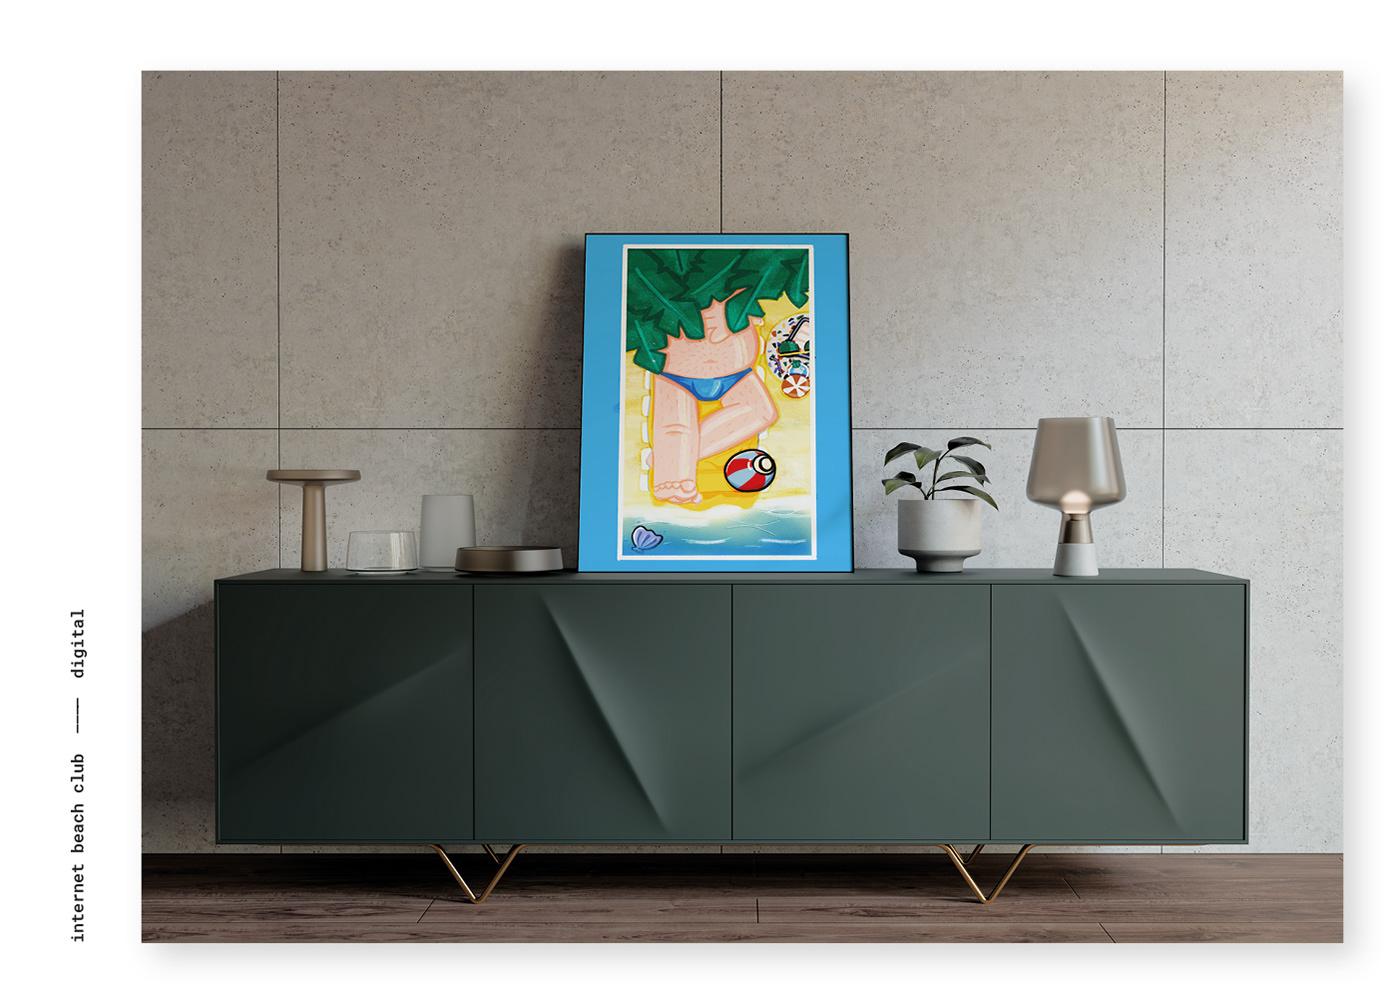 Image may contain: wall, furniture and cartoon